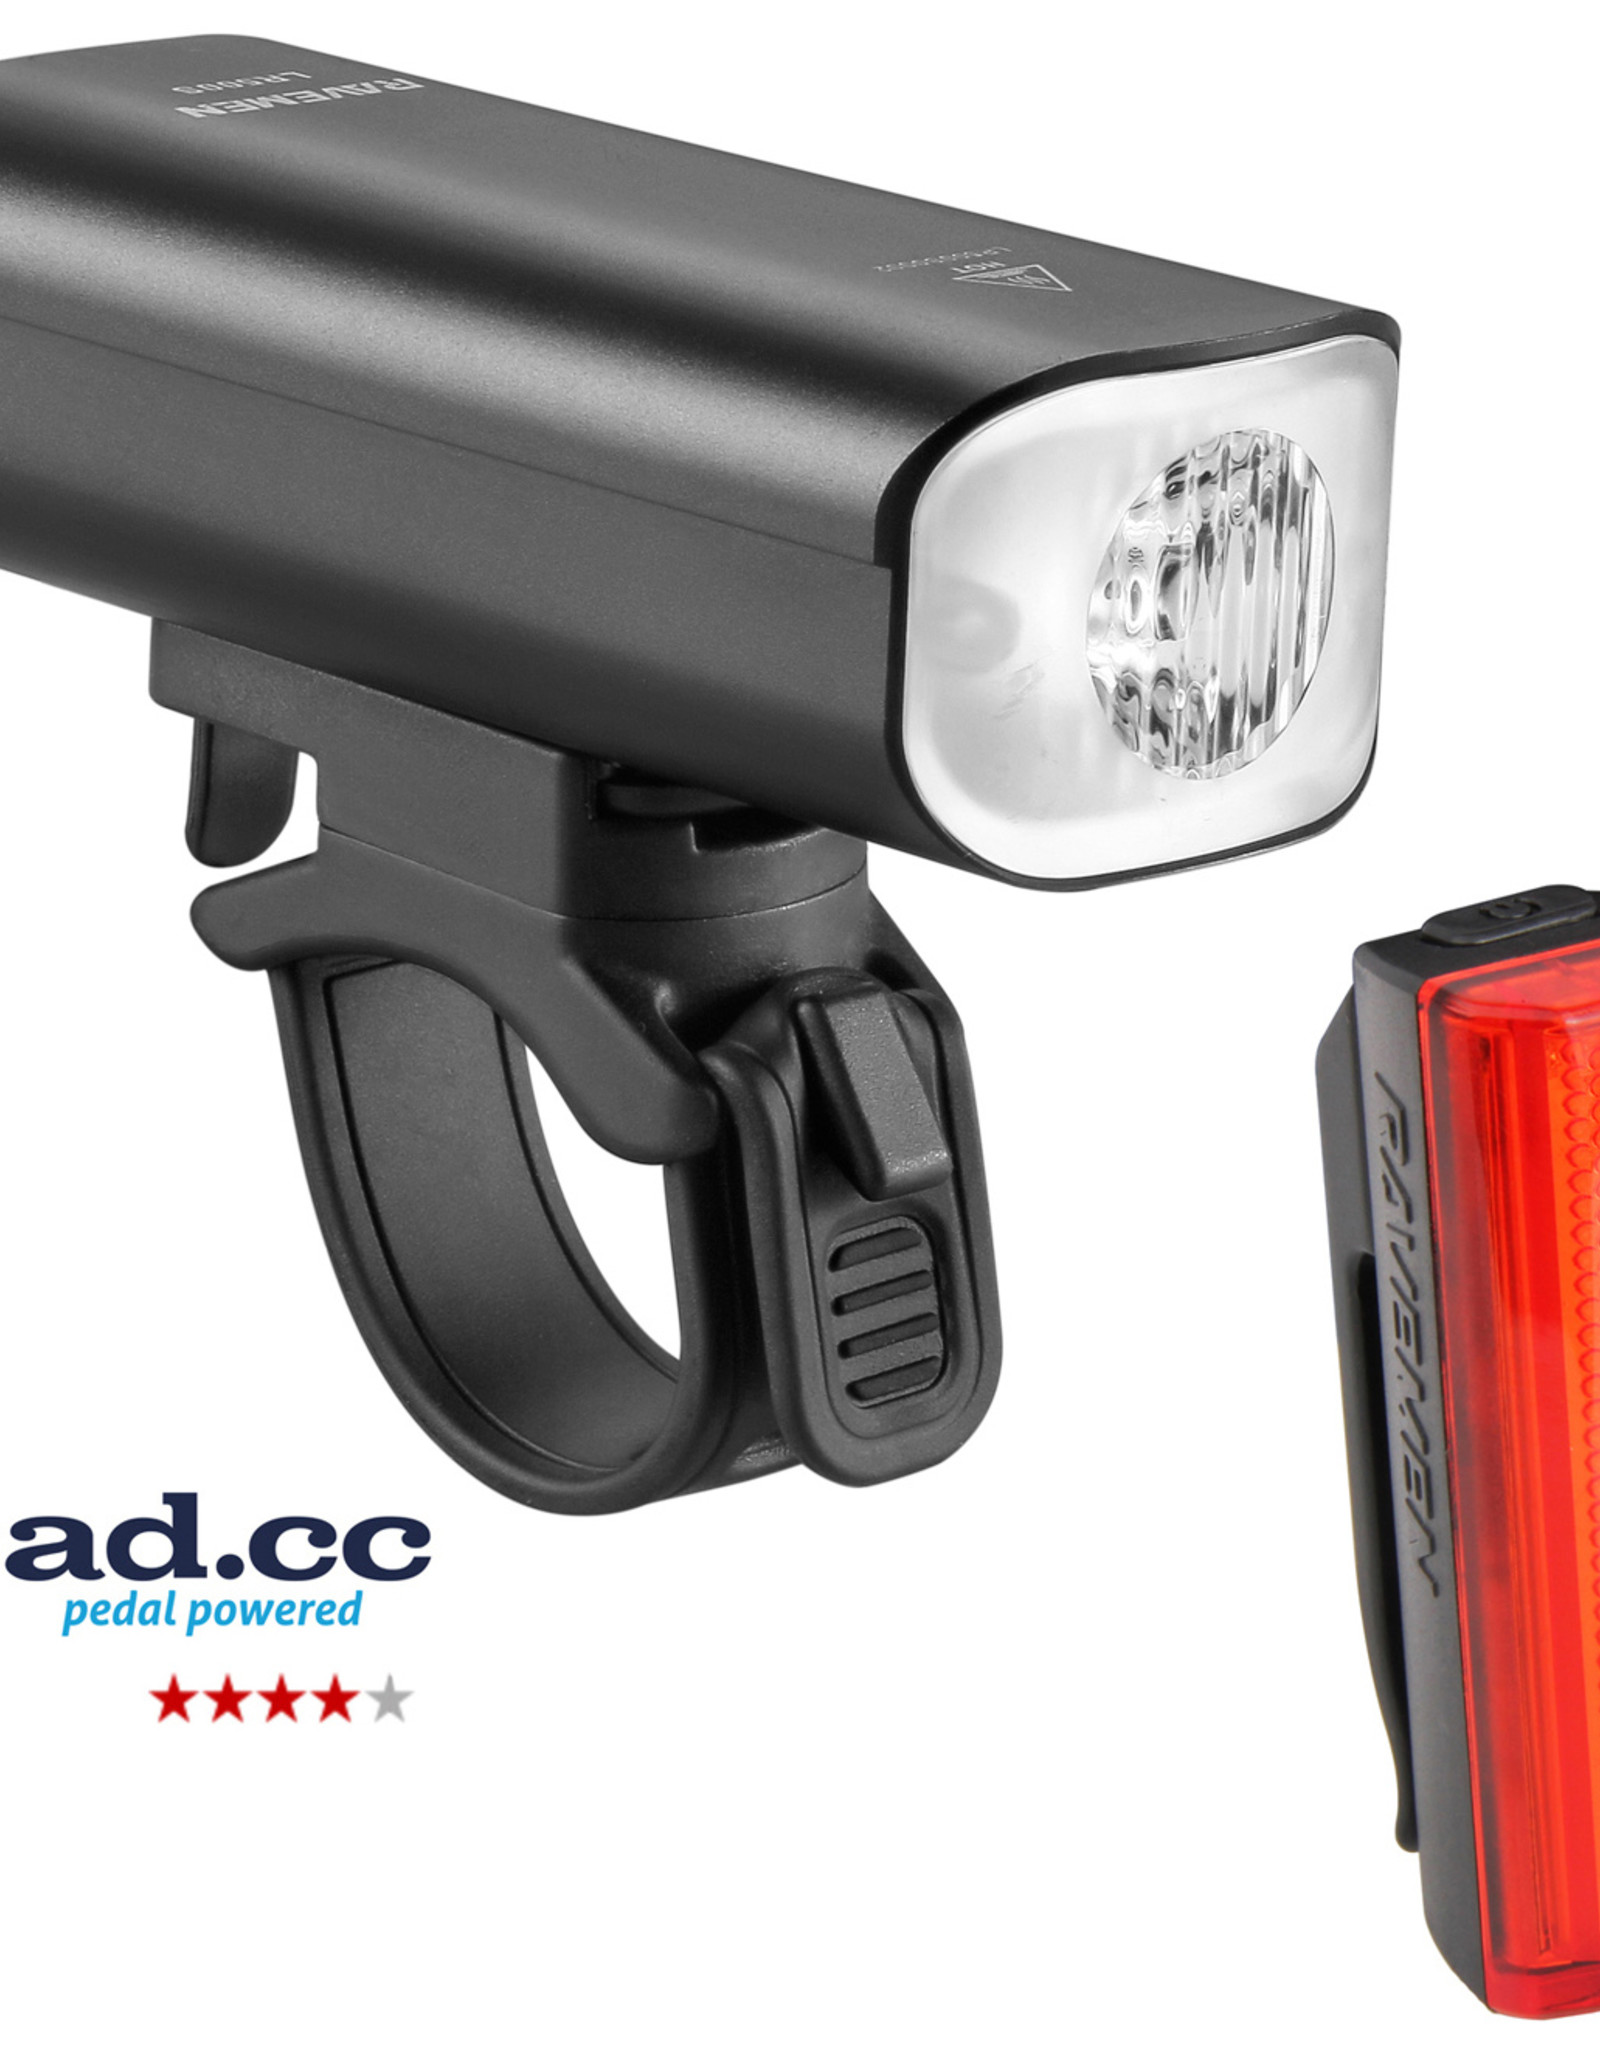 Ravemen LR500S (500 Lumens) / TR20 (20 Lumens) USB Rechargeable Twinset